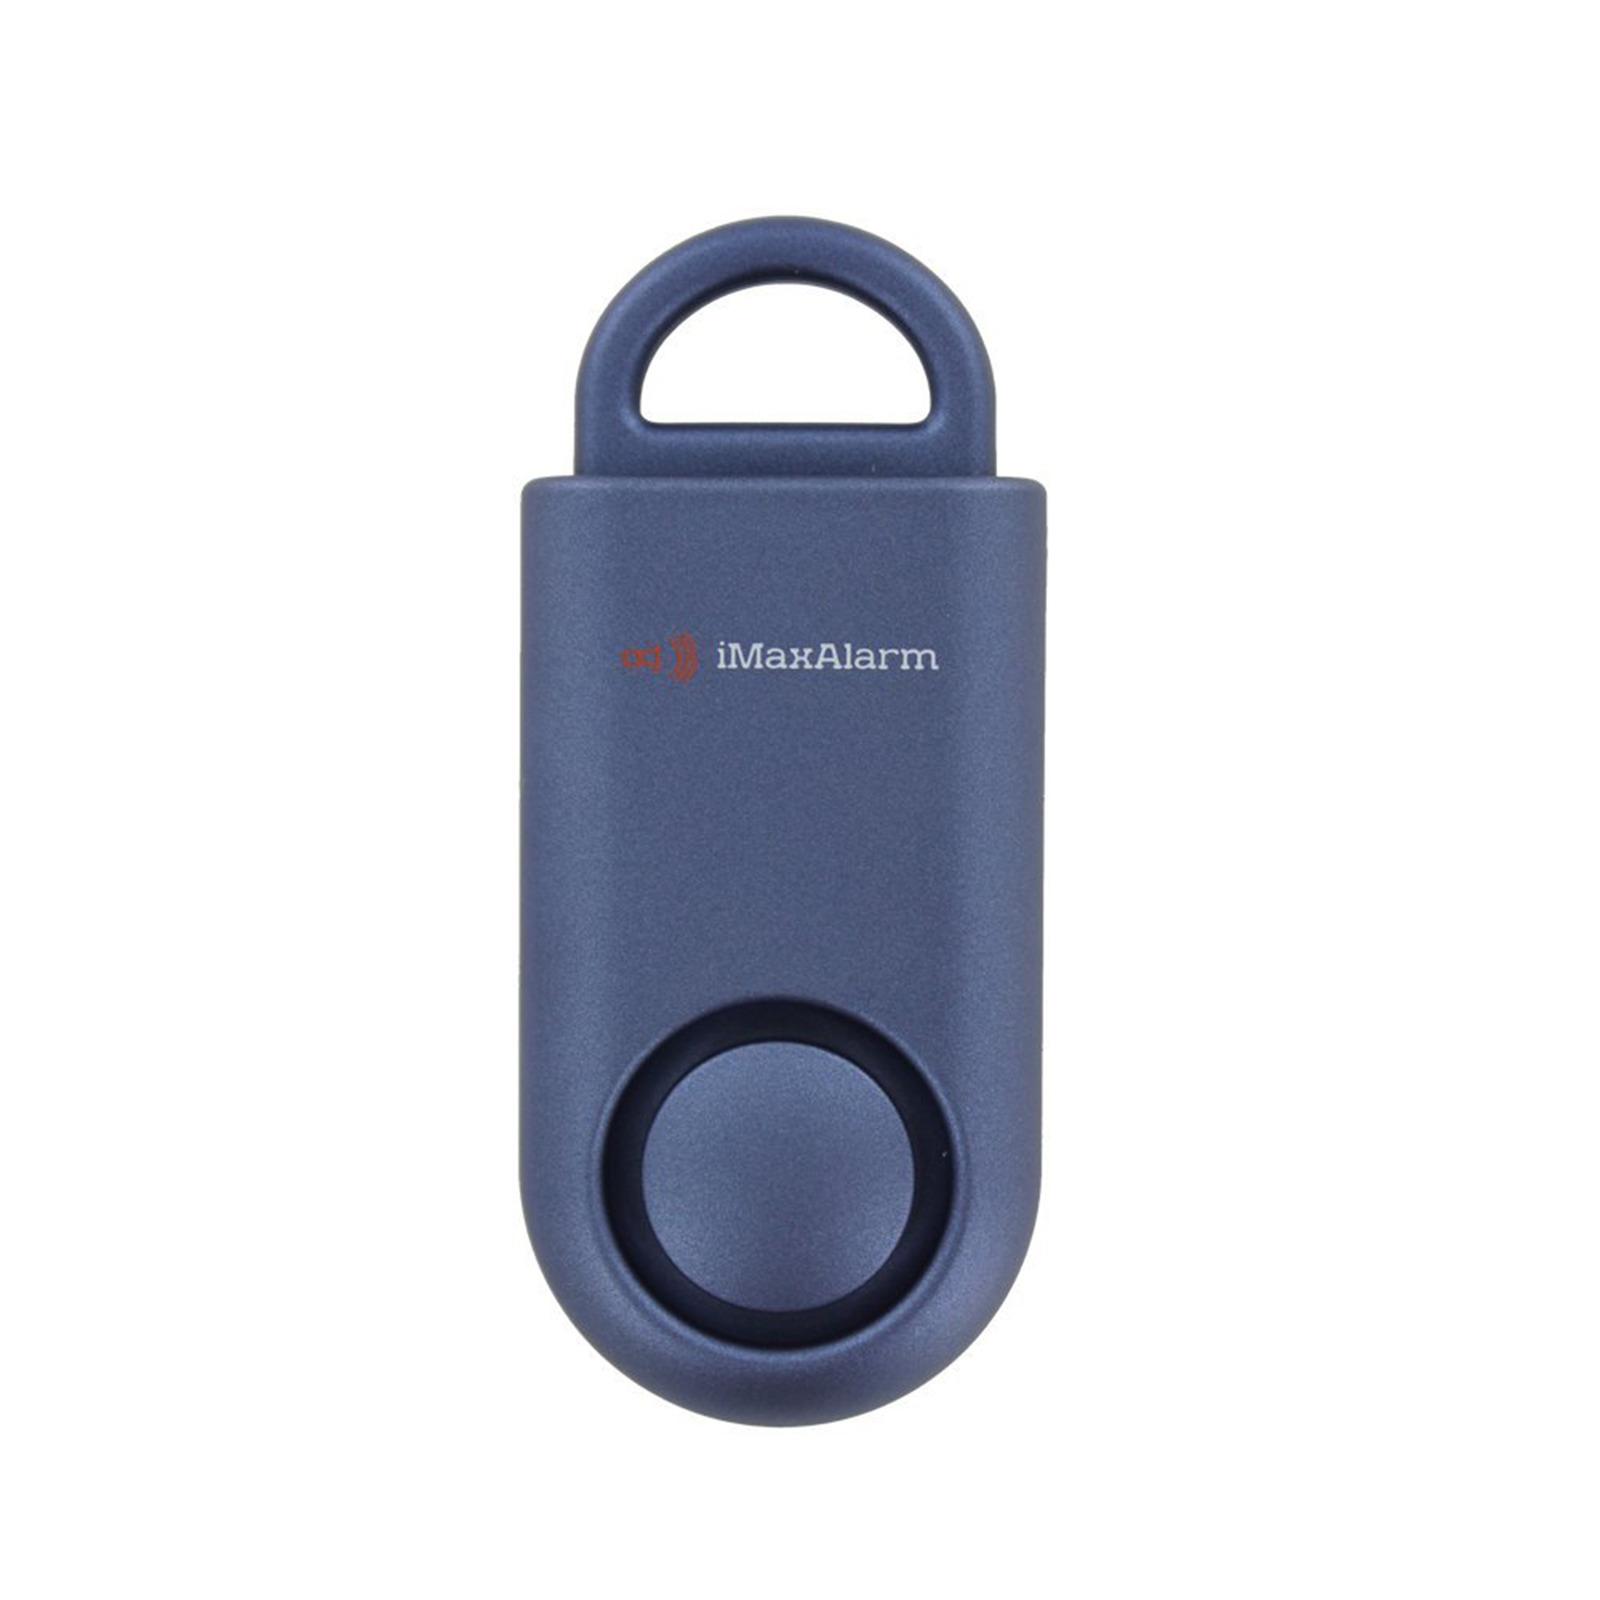 iMaxAlarm Portable SOS Alert Personal Security Alarm (Navy Blue)